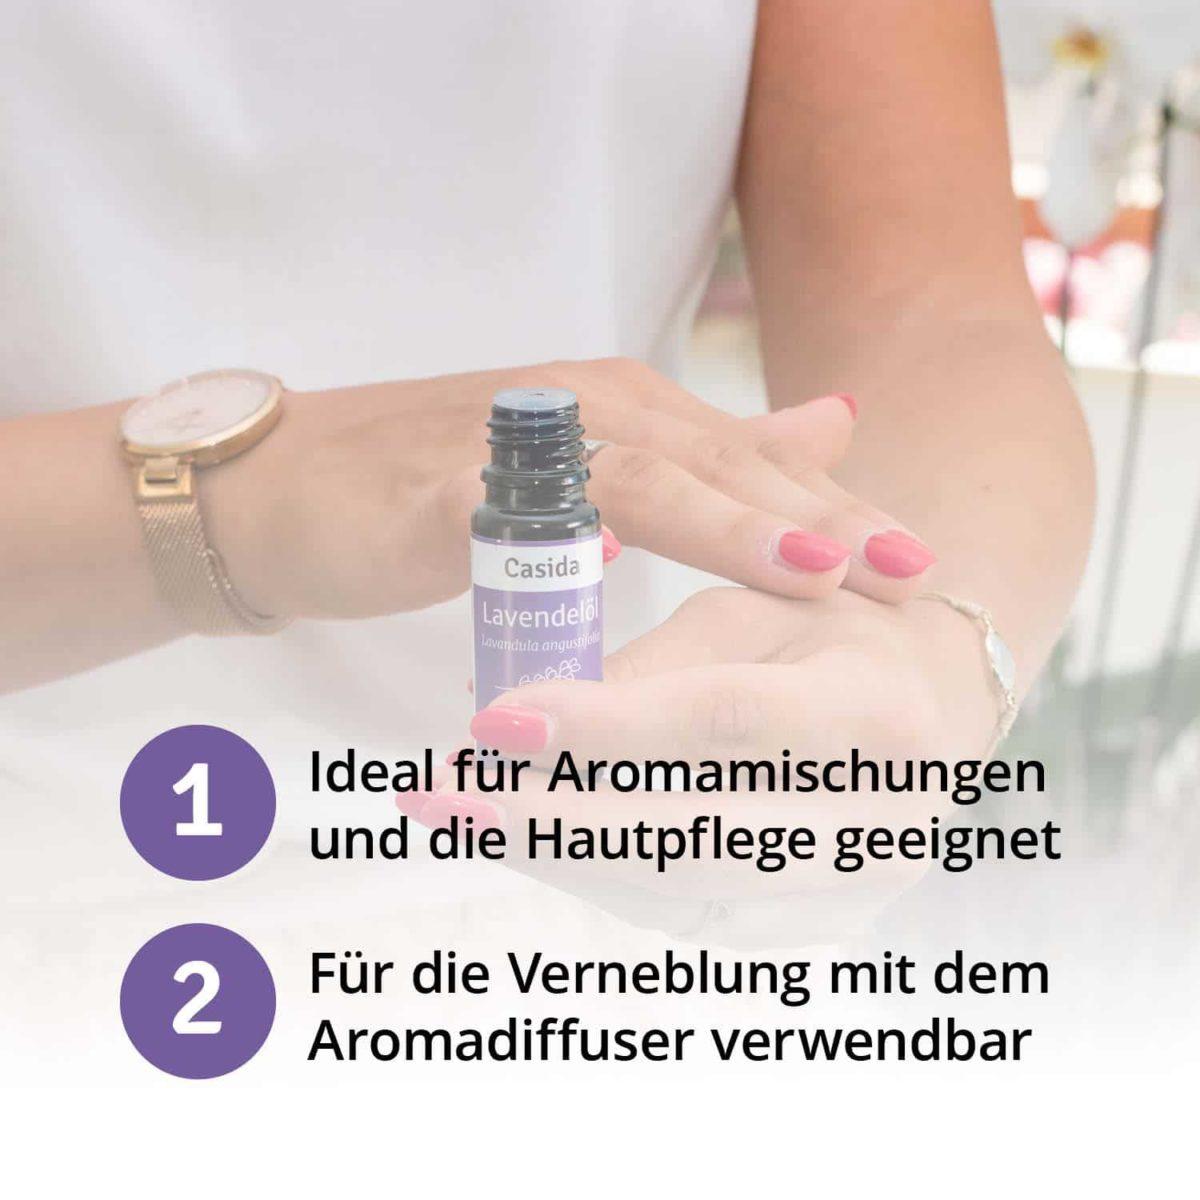 Casida Lavendelöl naturrein – 10 ml 15880722 PZN Apotheke Lavandula angustifolia Diffuser pur anwenden Schlaf Beruhigung6